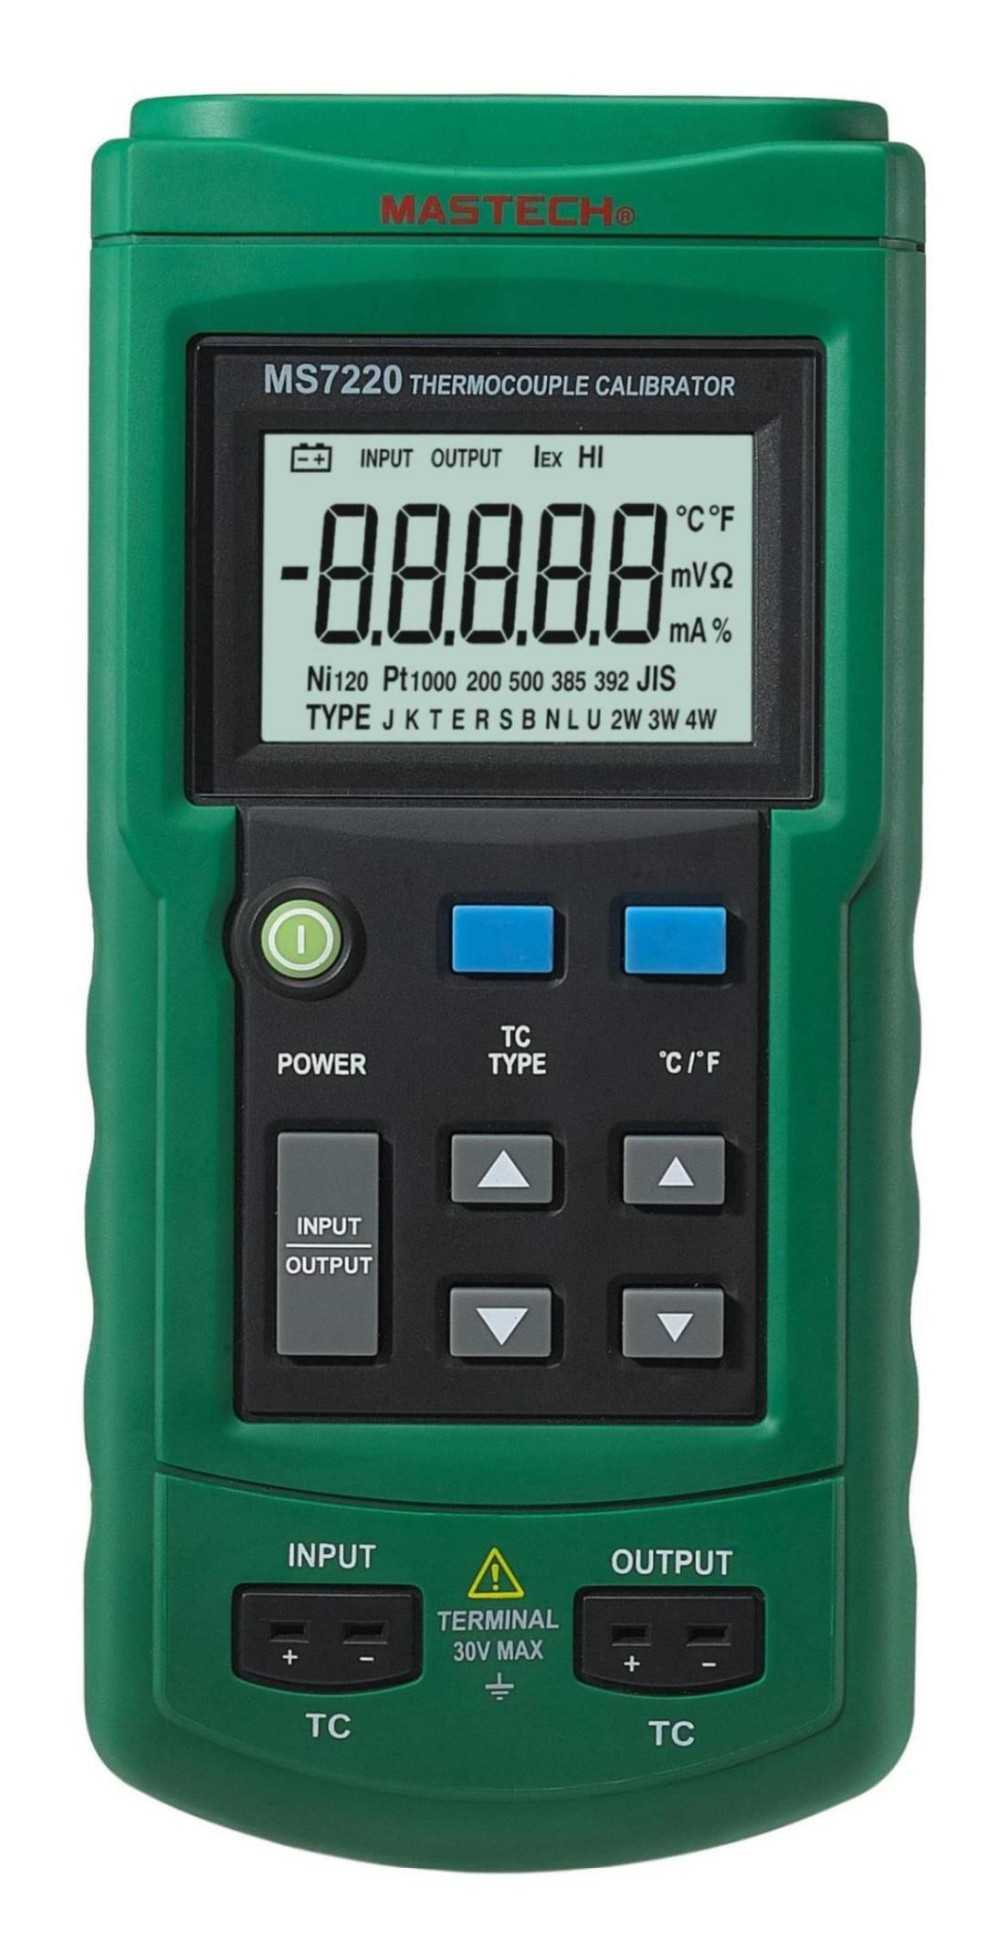 Huayi process calibrator thermocouple calibrator MS7220